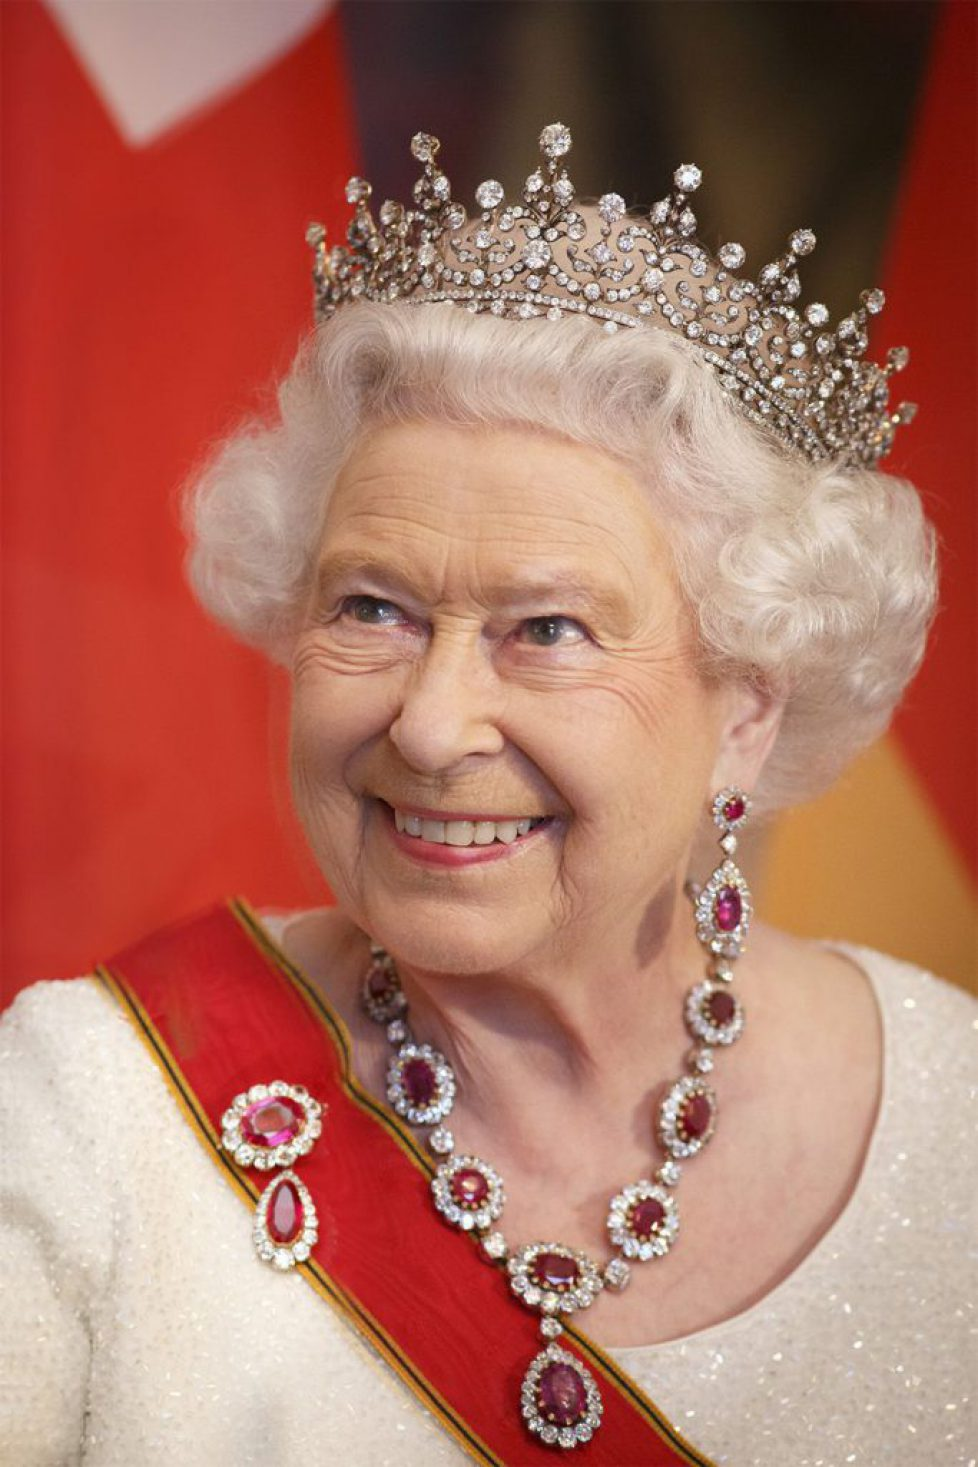 hbz-royal-hair-2015-queen-elizabeth-gettyimages-478375348-1500305808